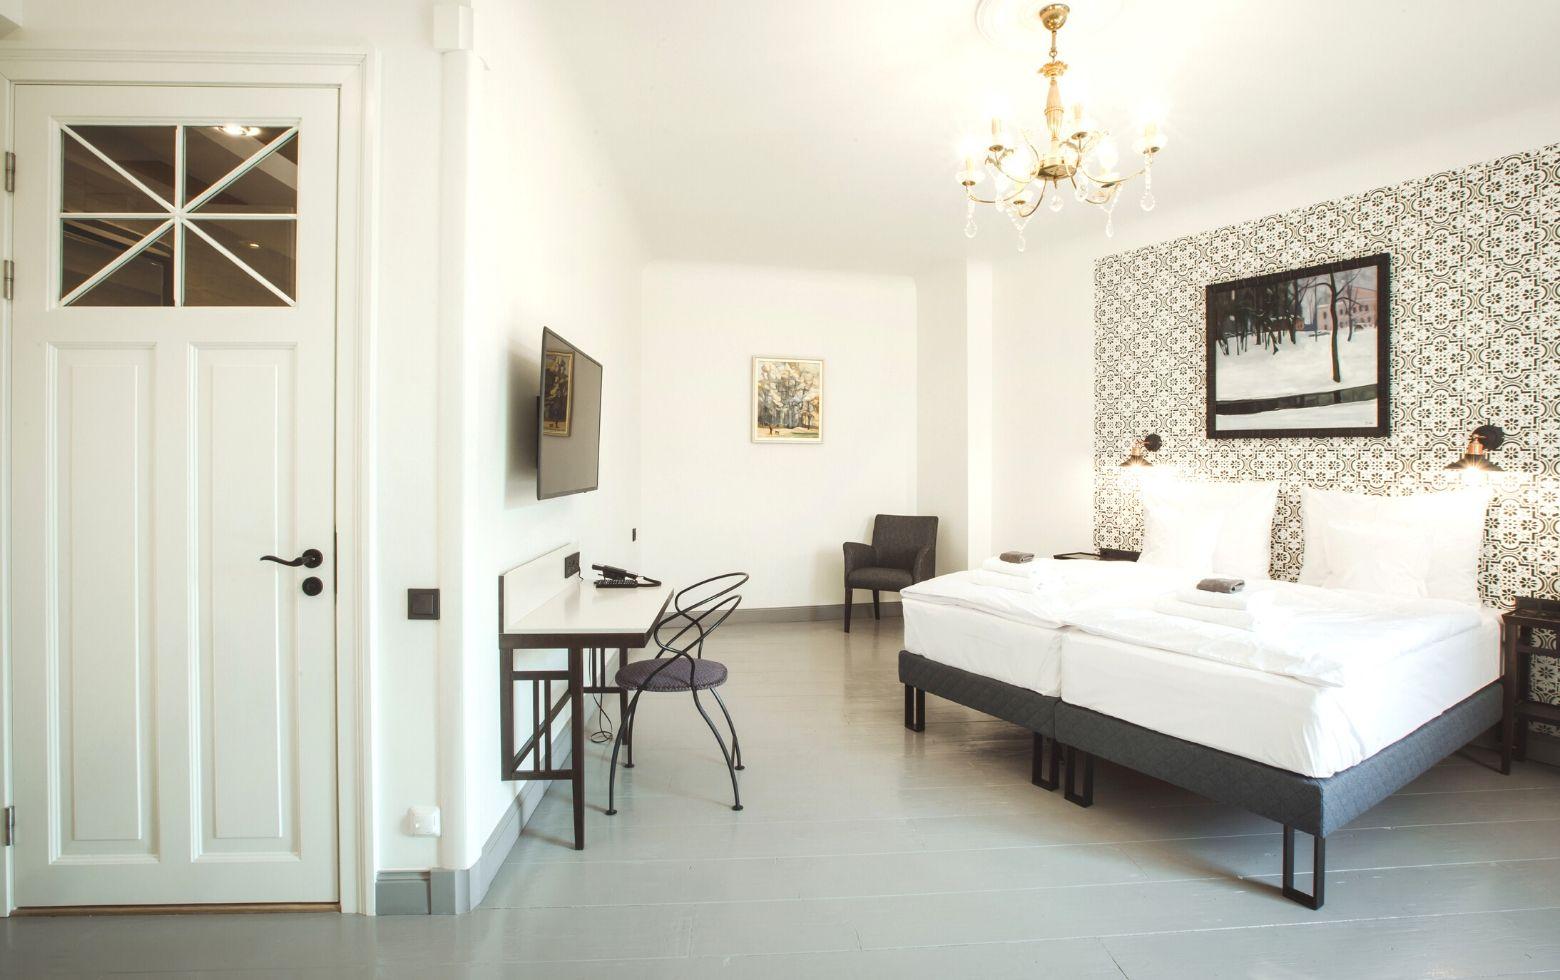 gospa-viesnicas-gal-art-hotel-roma